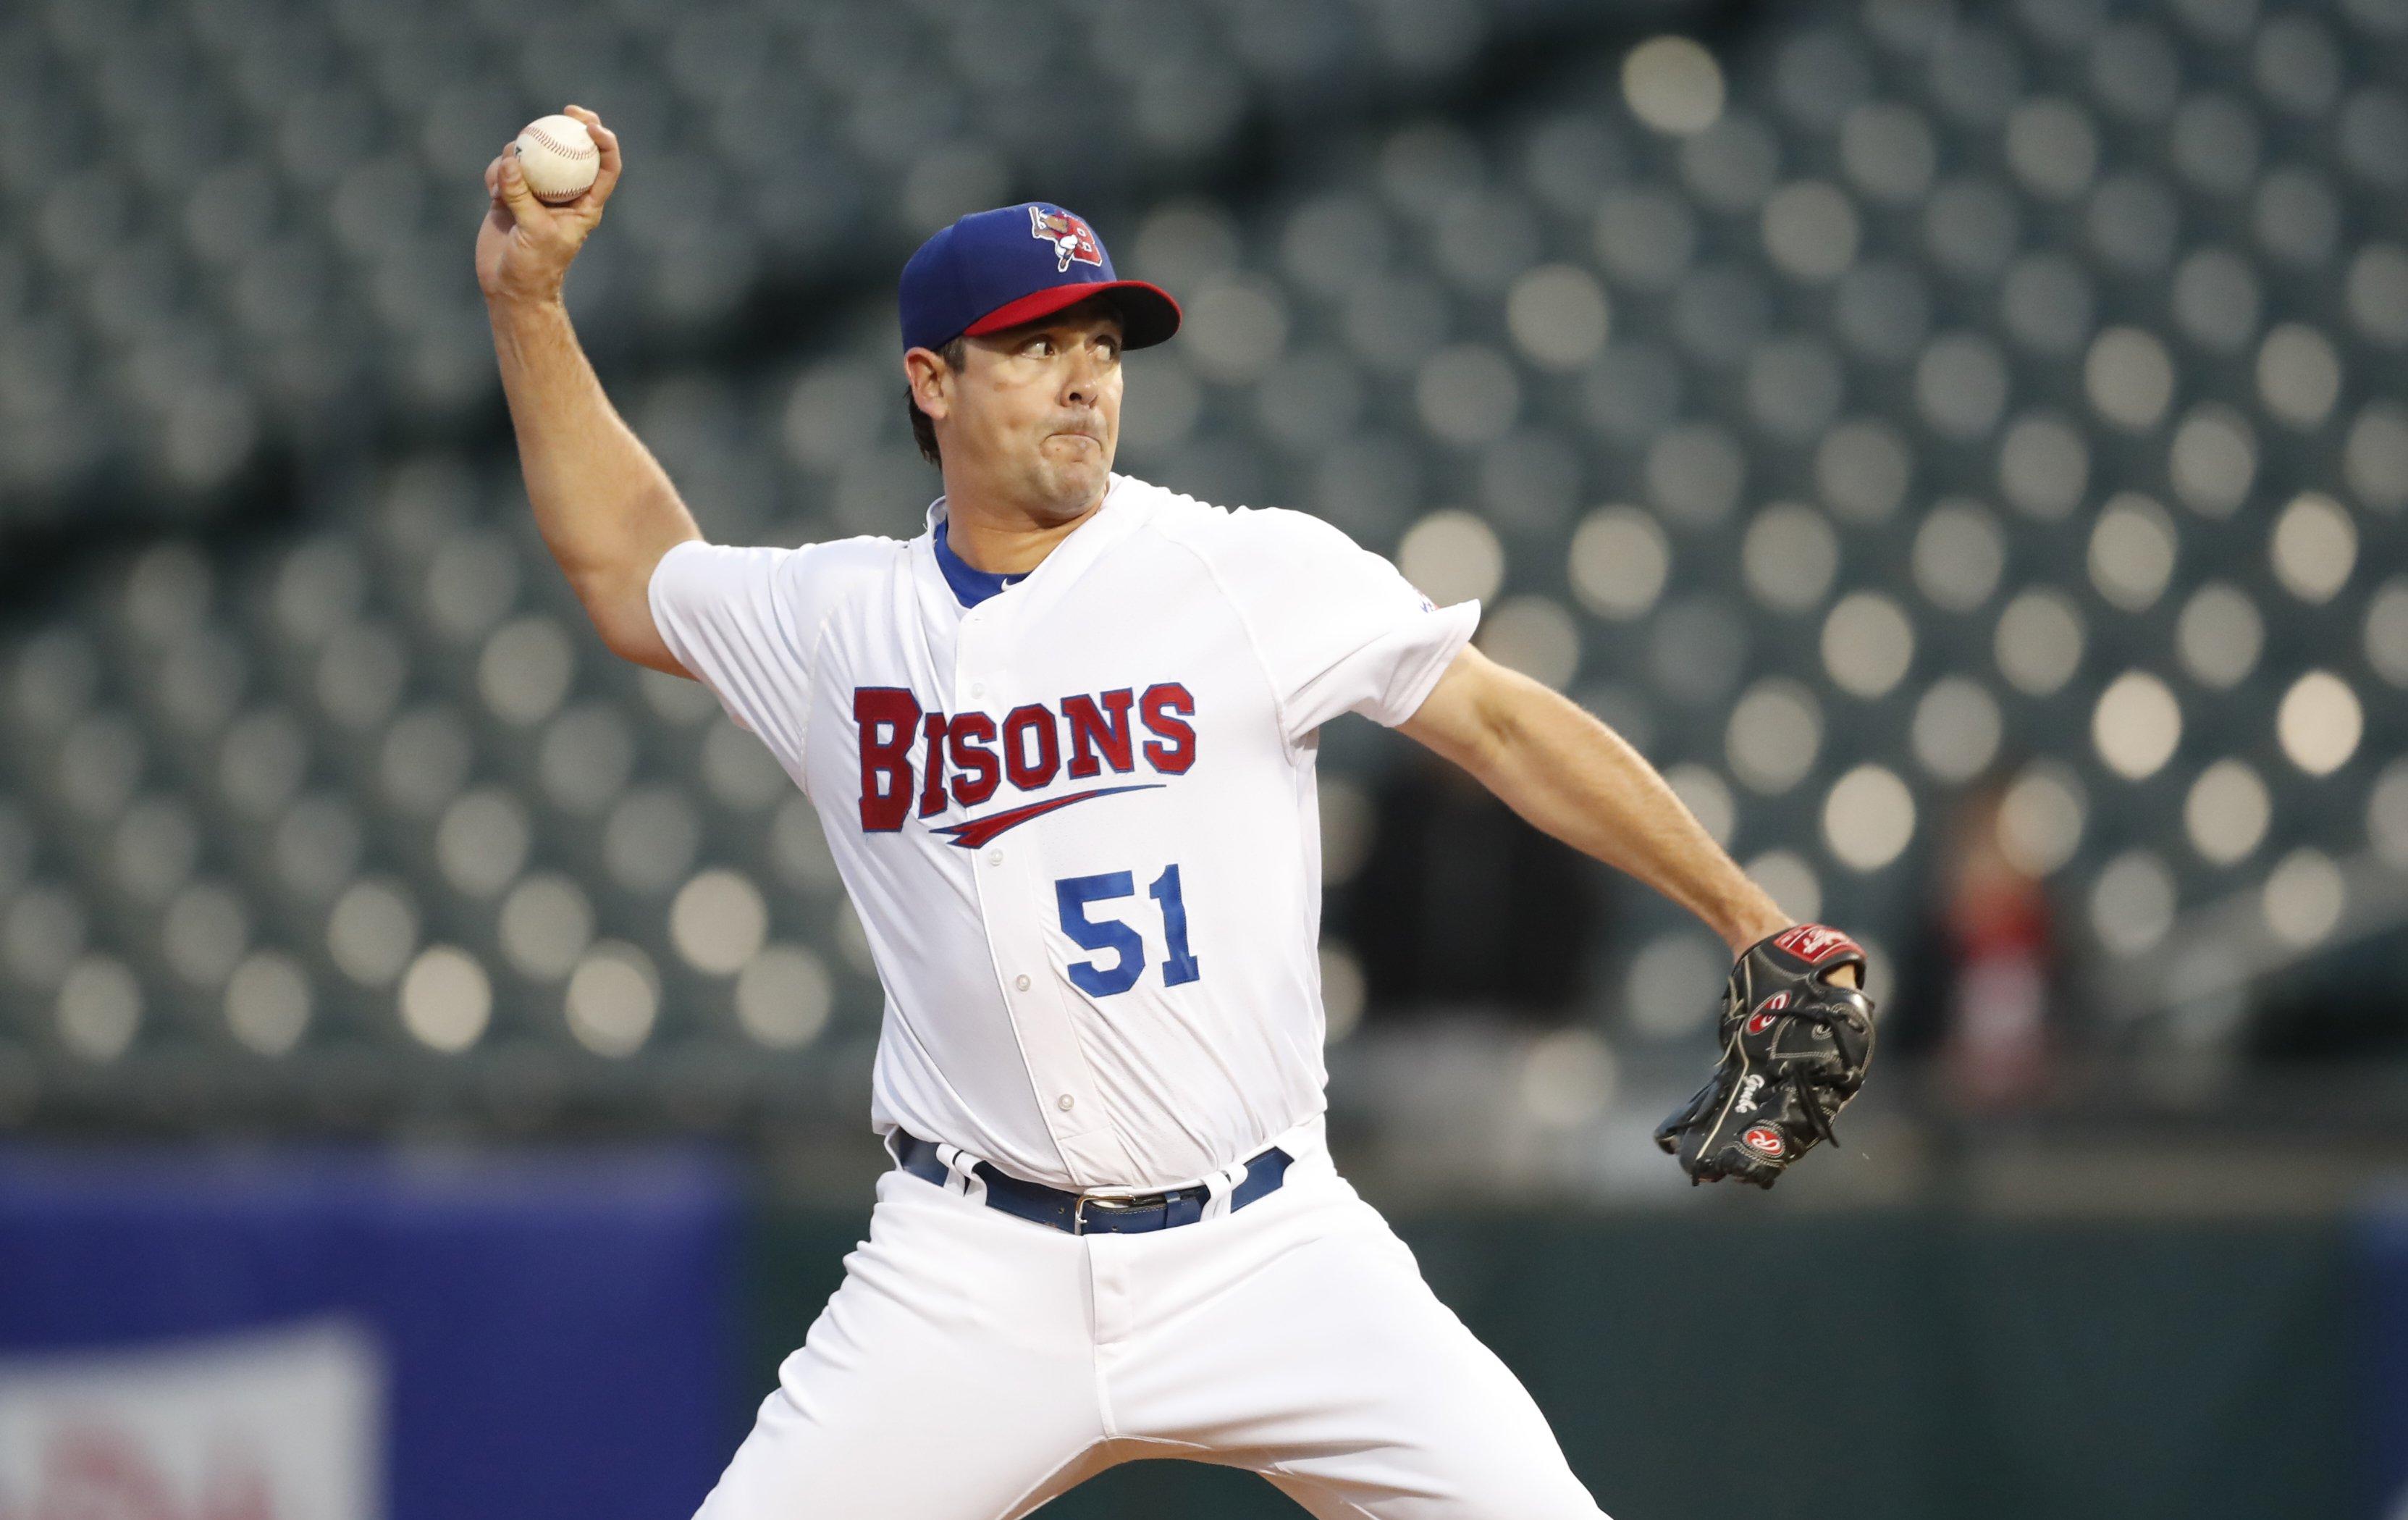 Bisons starter Jarrett Grube gave up eight runs, five earned, in four innings. (Harry Scull Jr./Buffalo News)